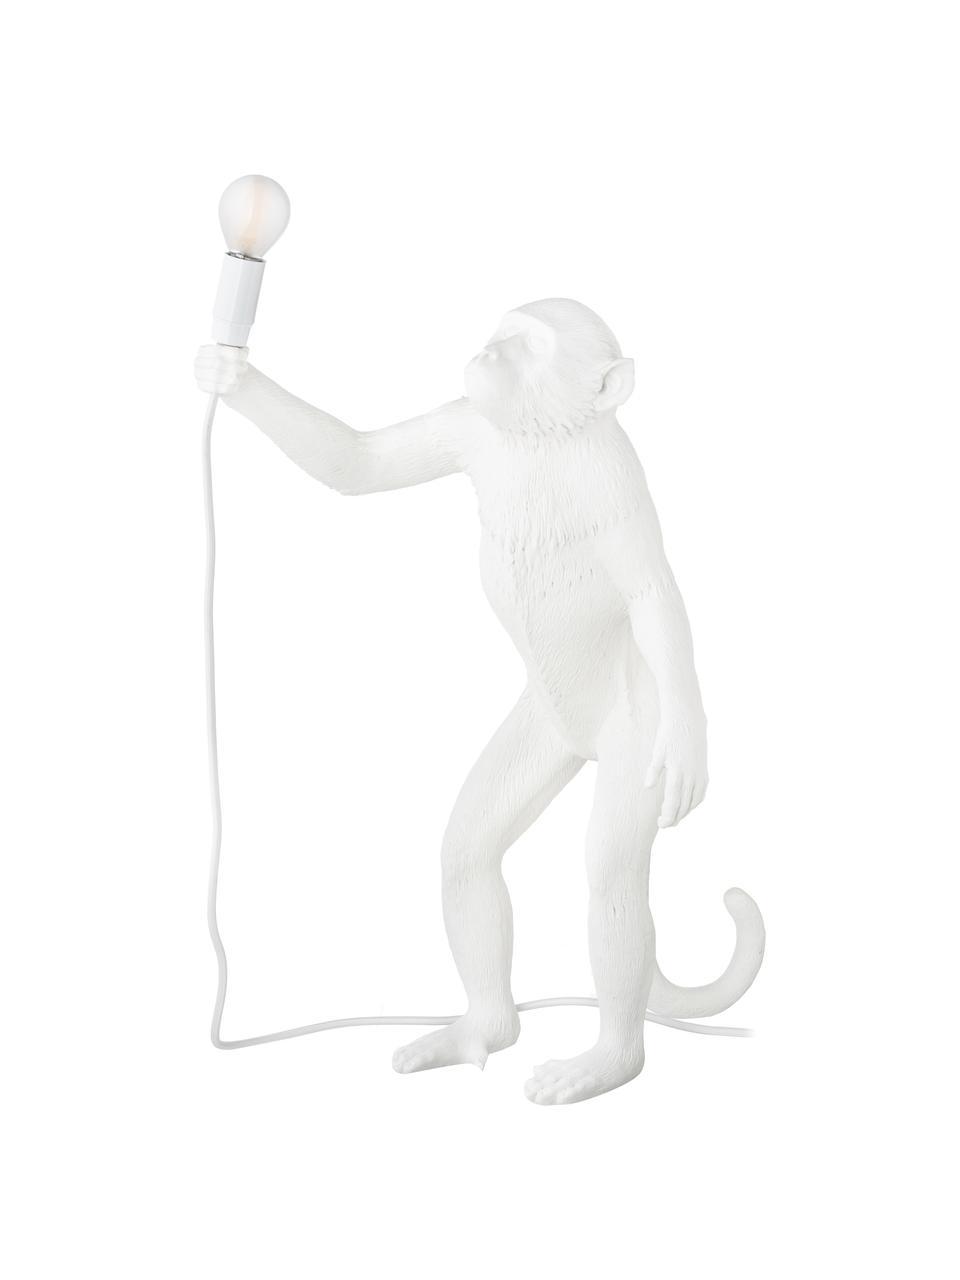 Lampada da tavolo di design Monkey, Lampada: resina sintetica, Bianco, Larg. 46 x Alt. 54 cm